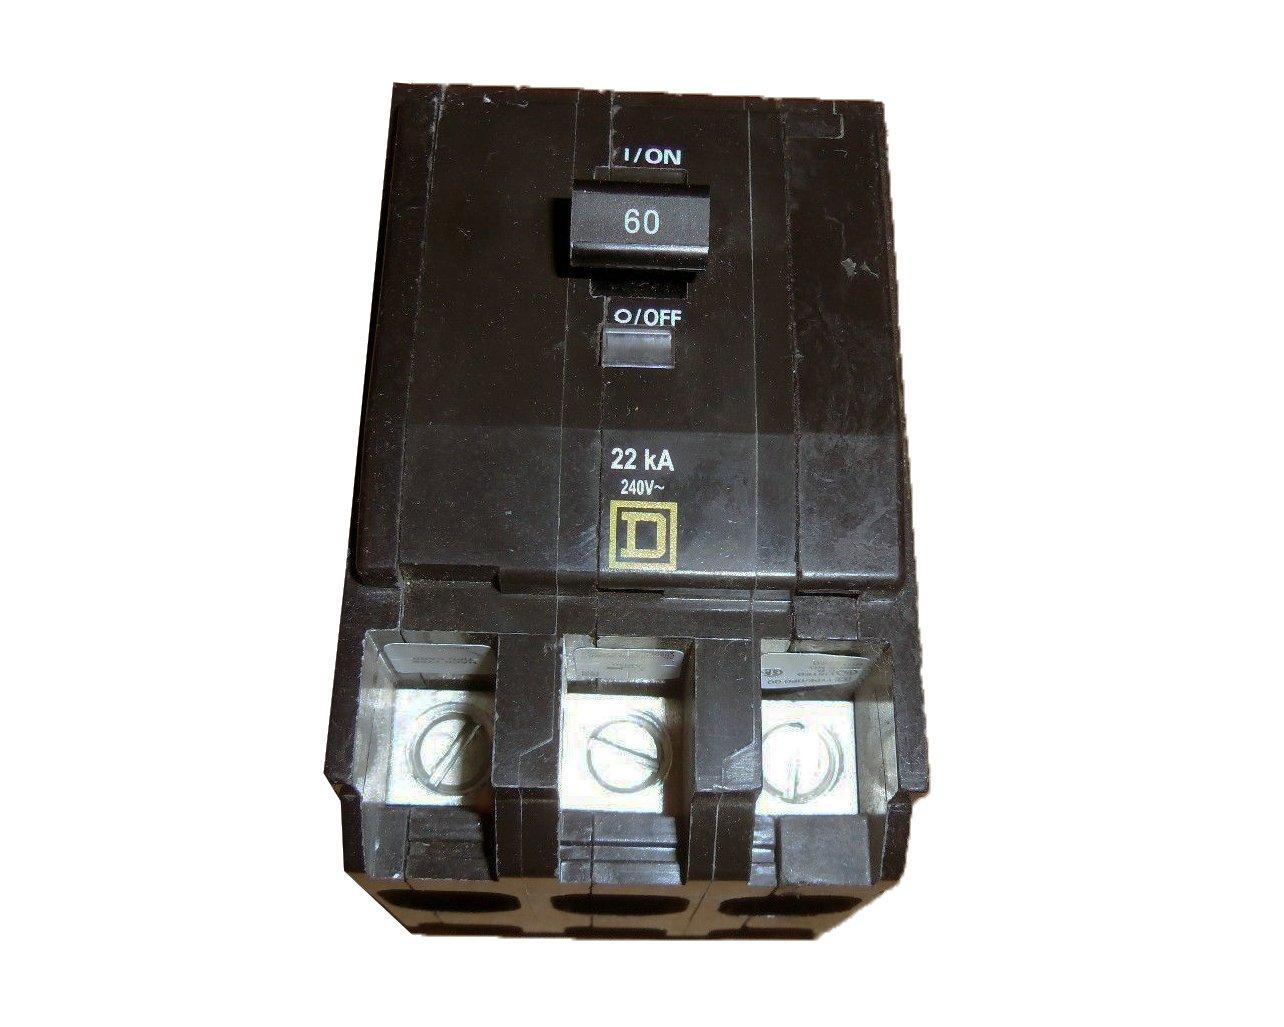 SCHNEIDER ELECTRIC Miniature Circuit Breaker 240-Volt 60-Amp QO360VH 3 in. Electric Eye Inspection Window by Schneider Electric